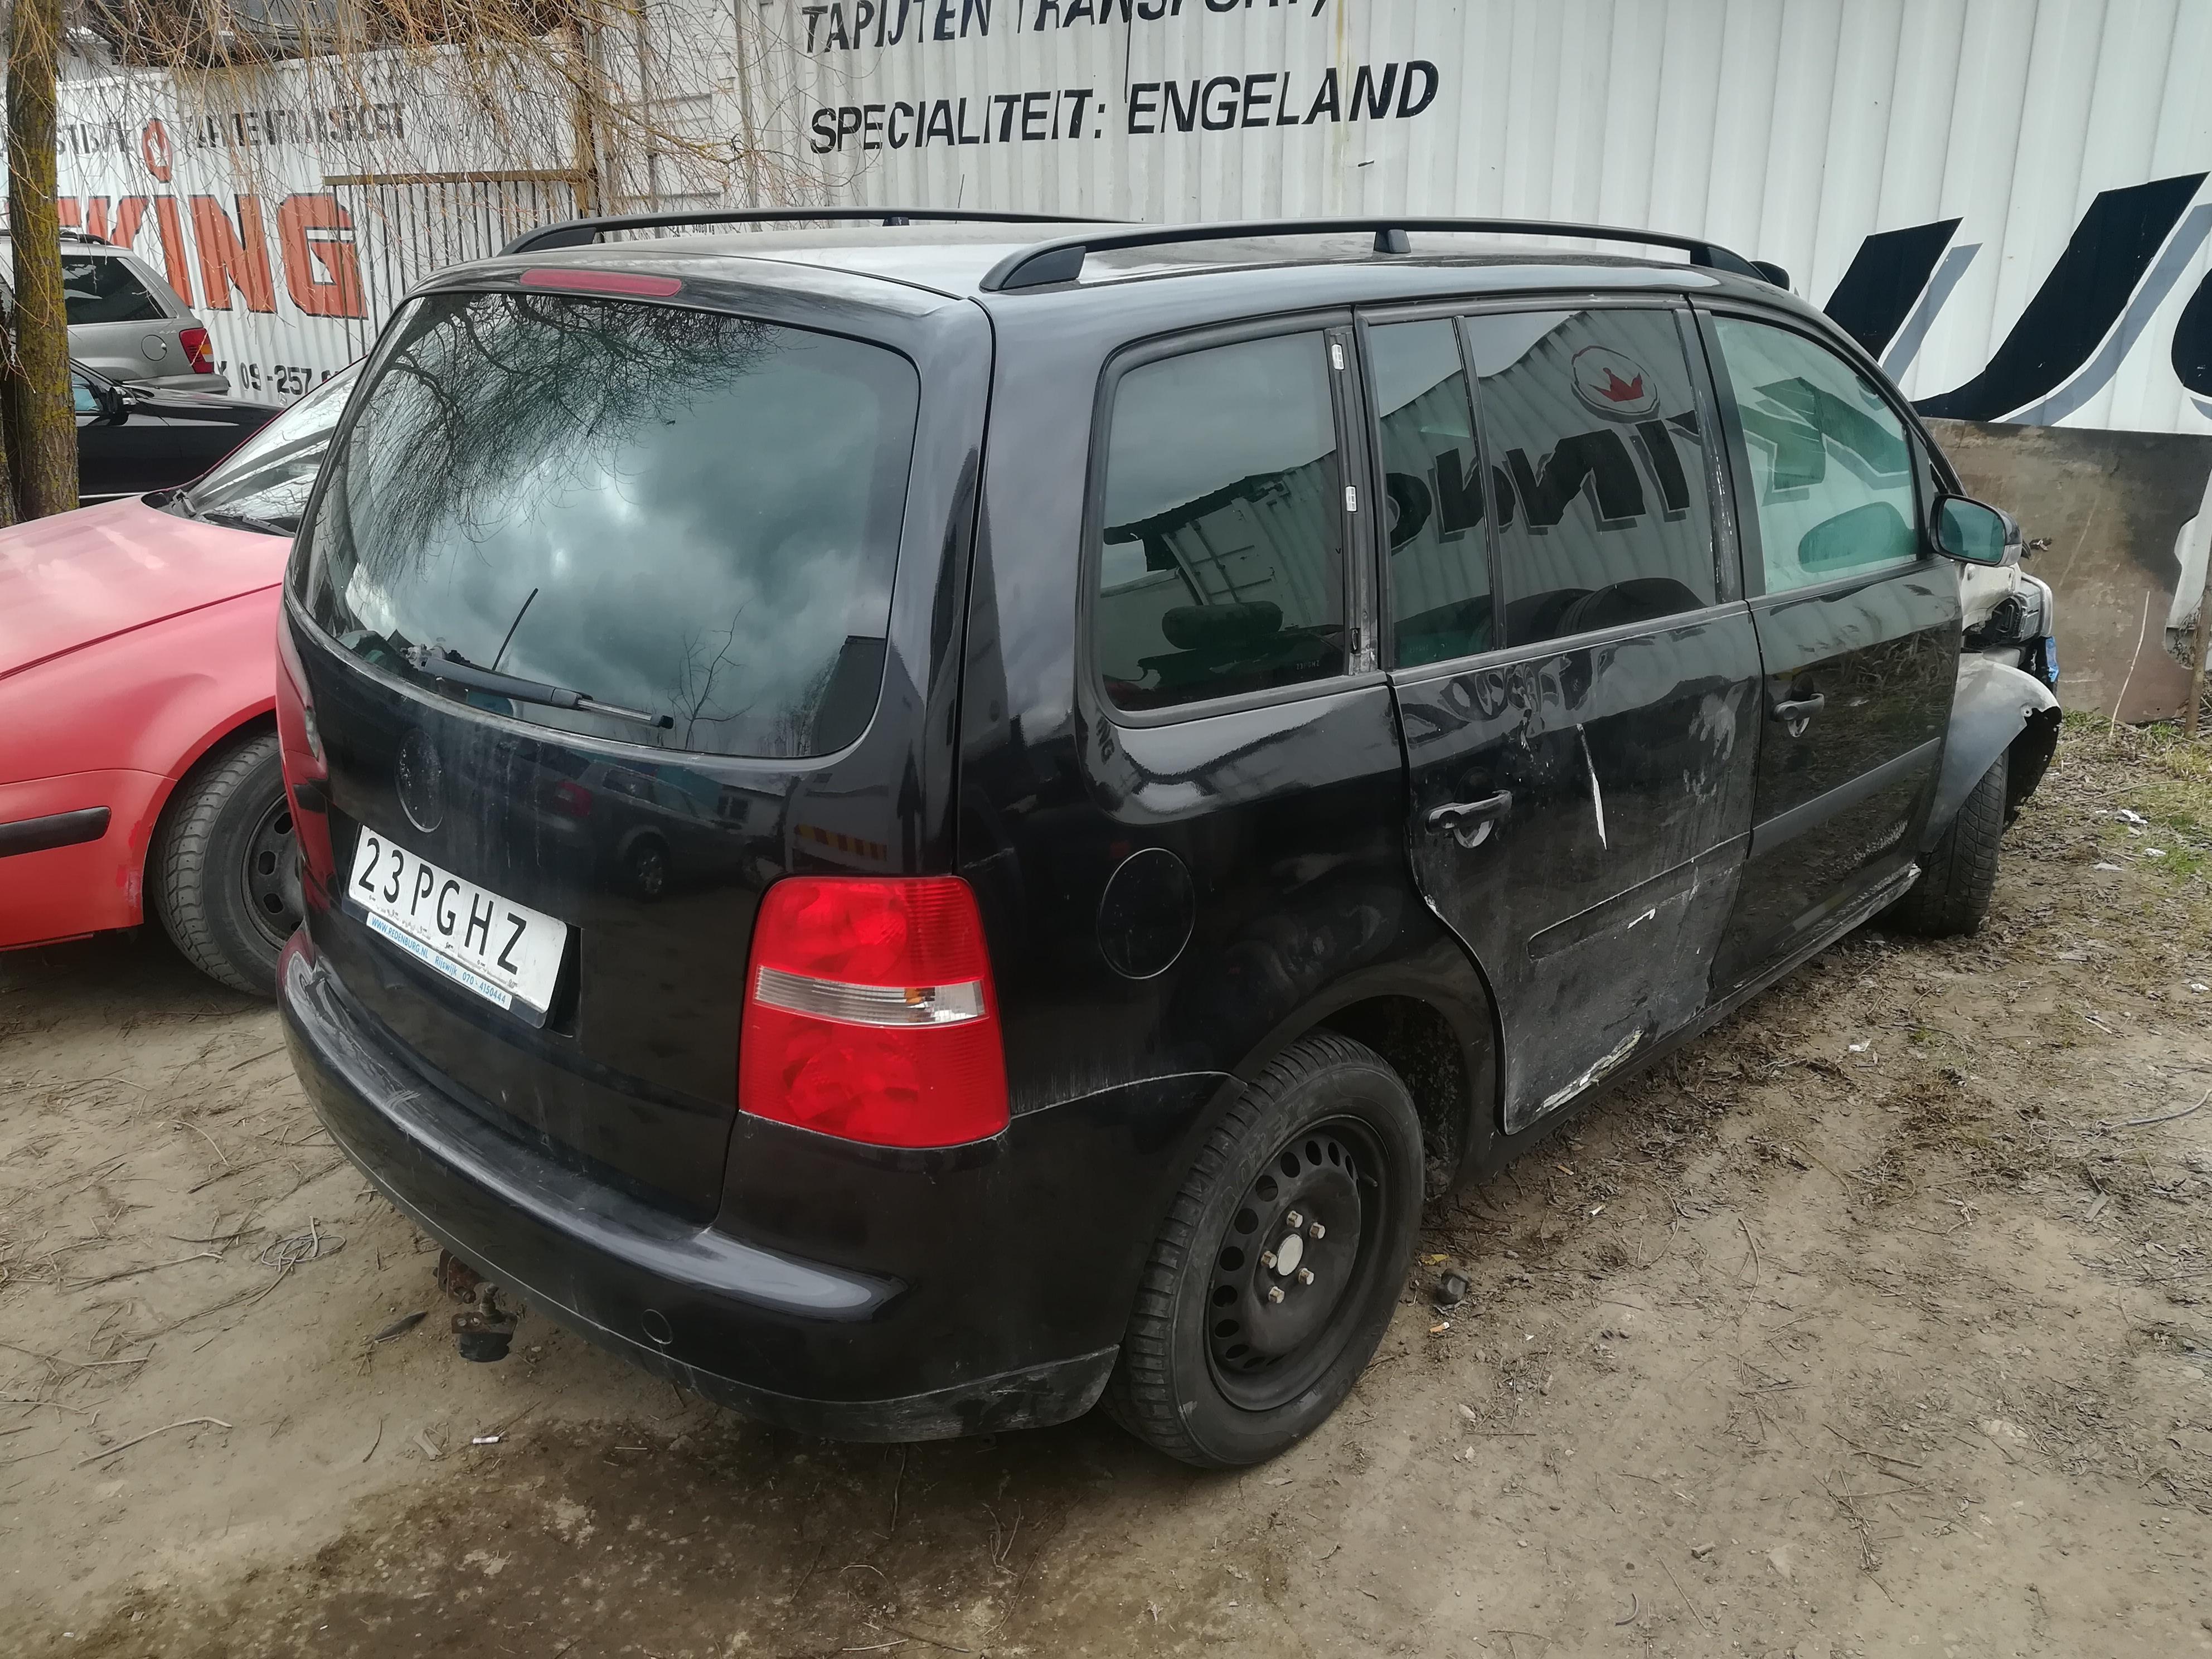 Used Car Parts Foto 9 Volkswagen TOURAN 2004 2.0 Automatic Minivan 4/5 d. Black 2019-4-11 A4417